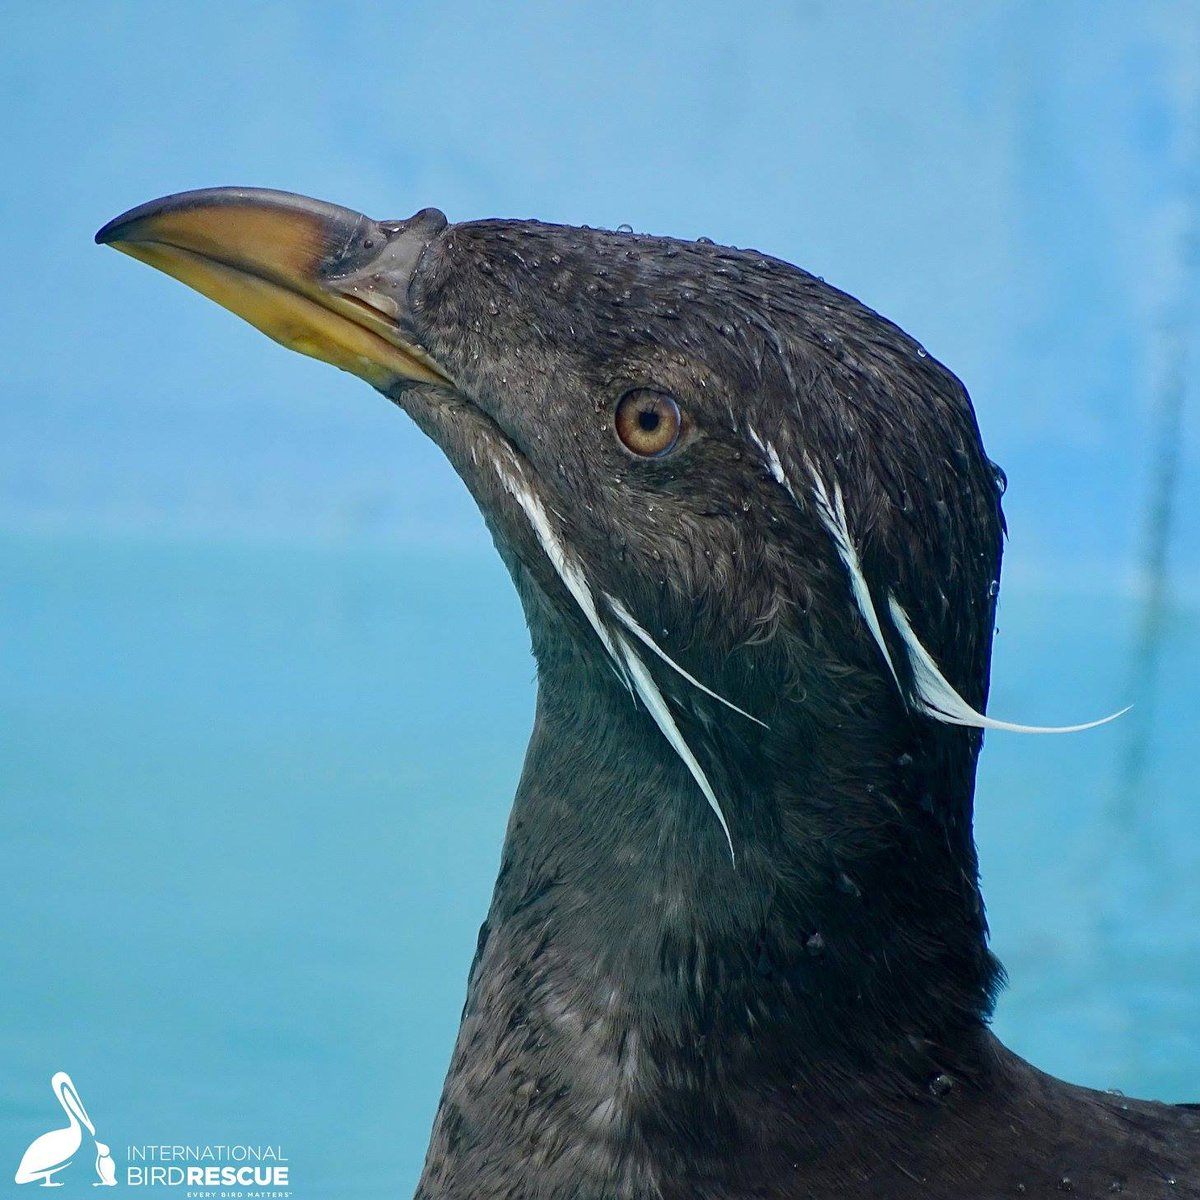 birdfacts hashtag on Twitter